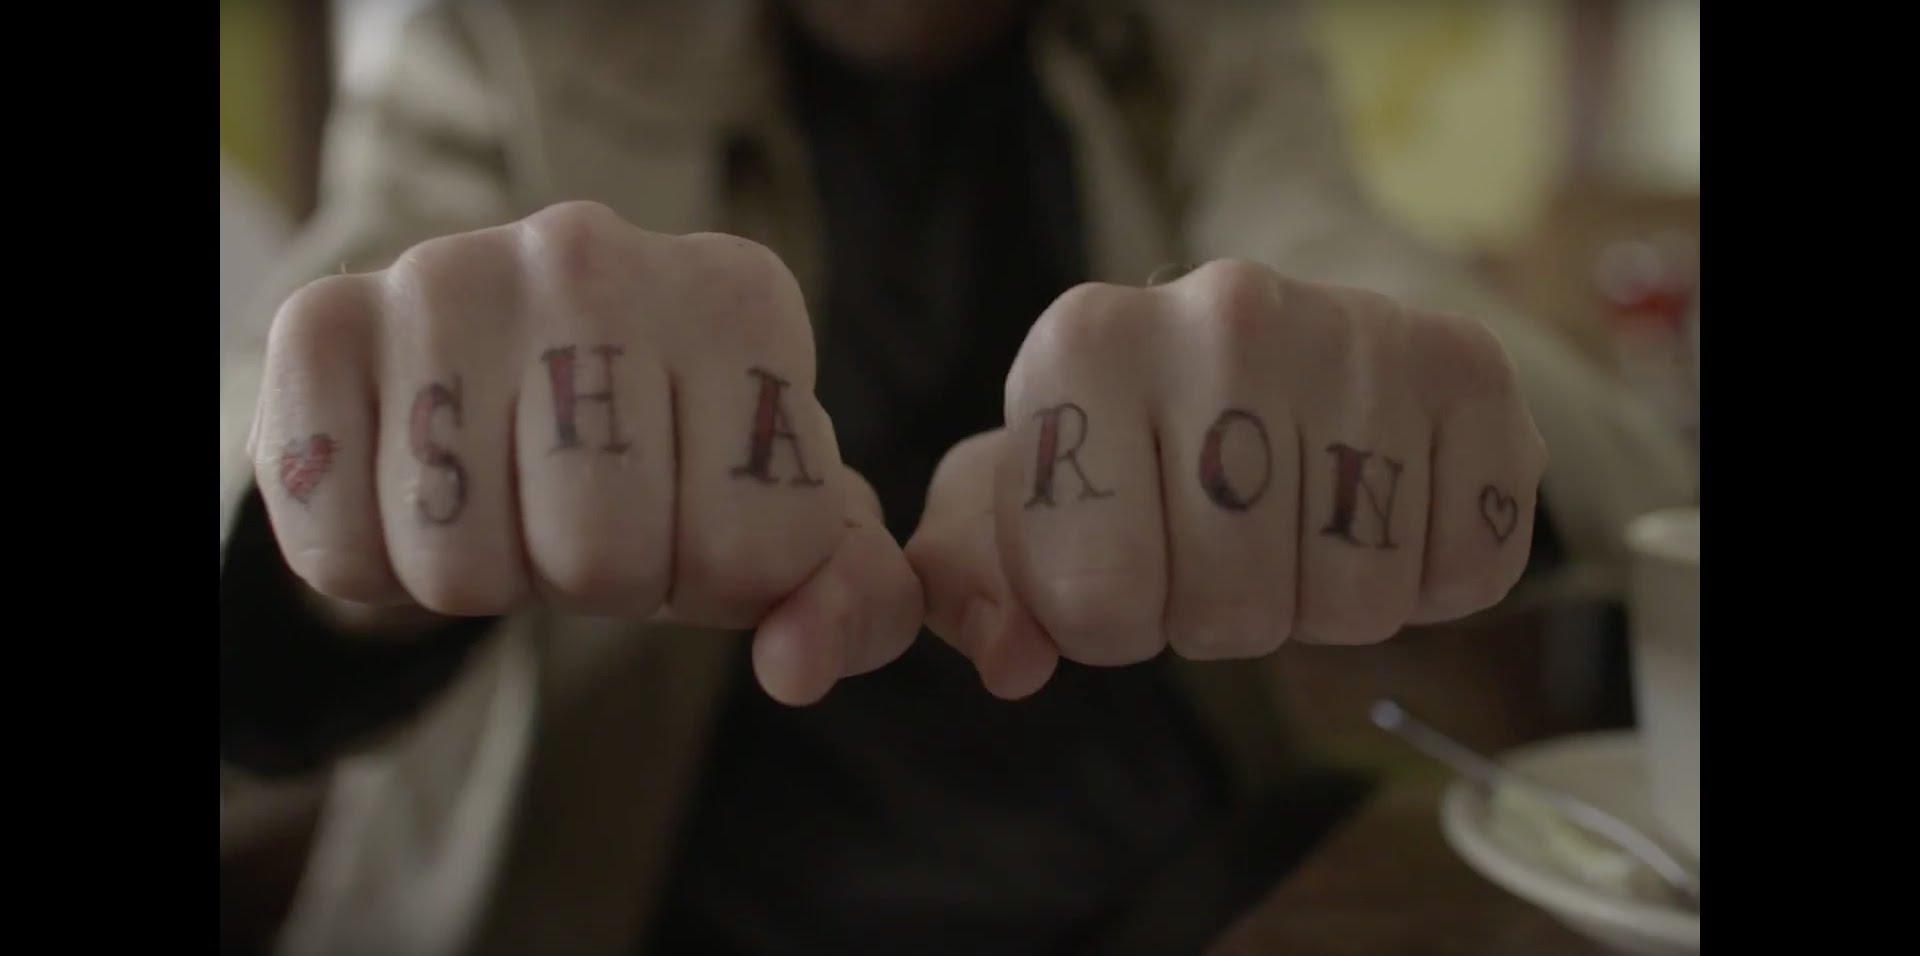 The Frightnrs - Sharon [10/19/2015]